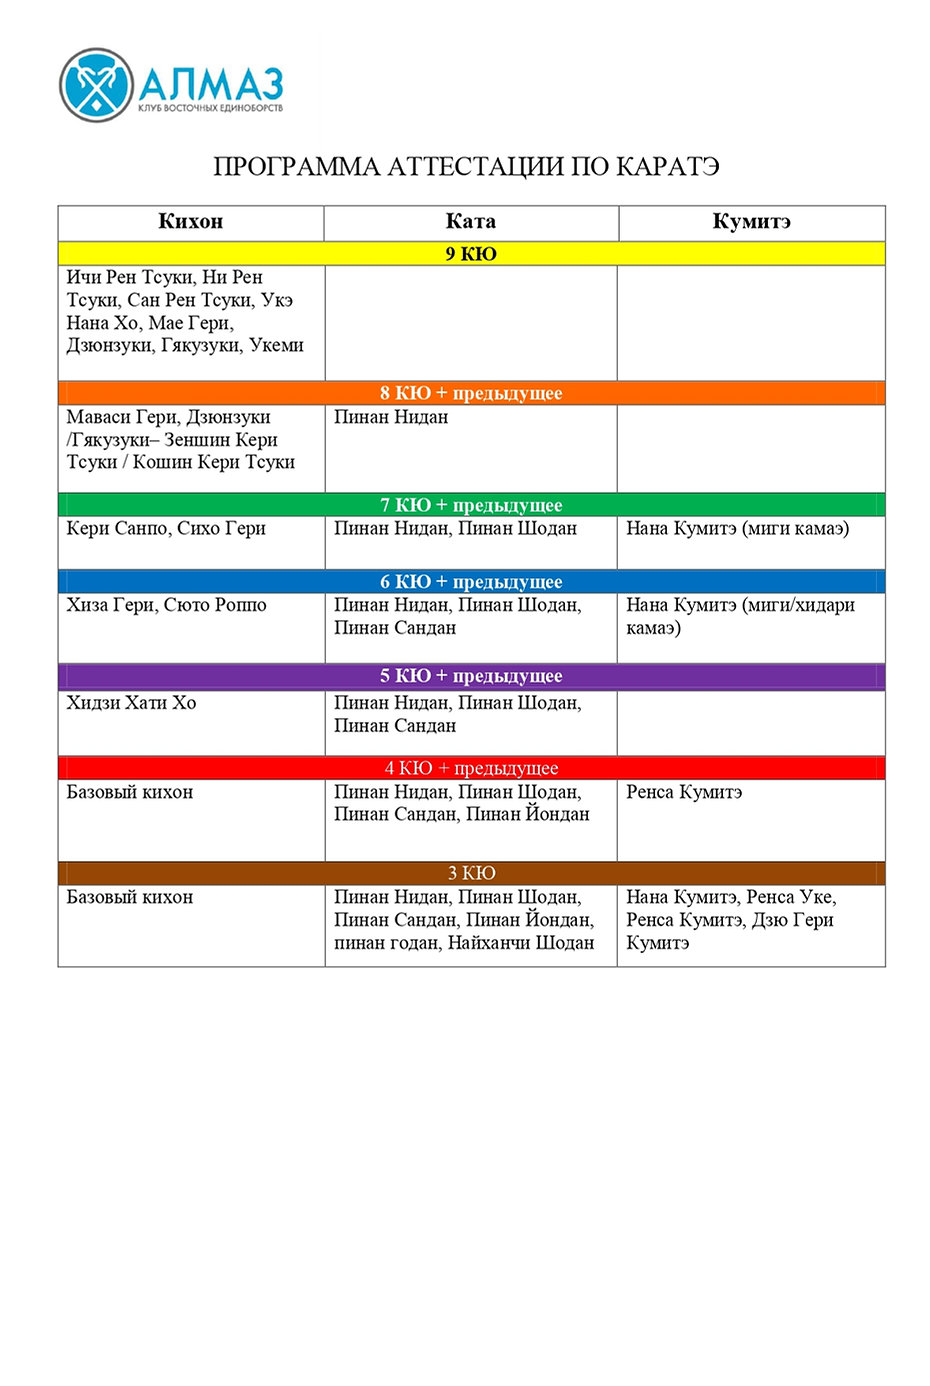 Программа аттестации по Каратэ_page-0001